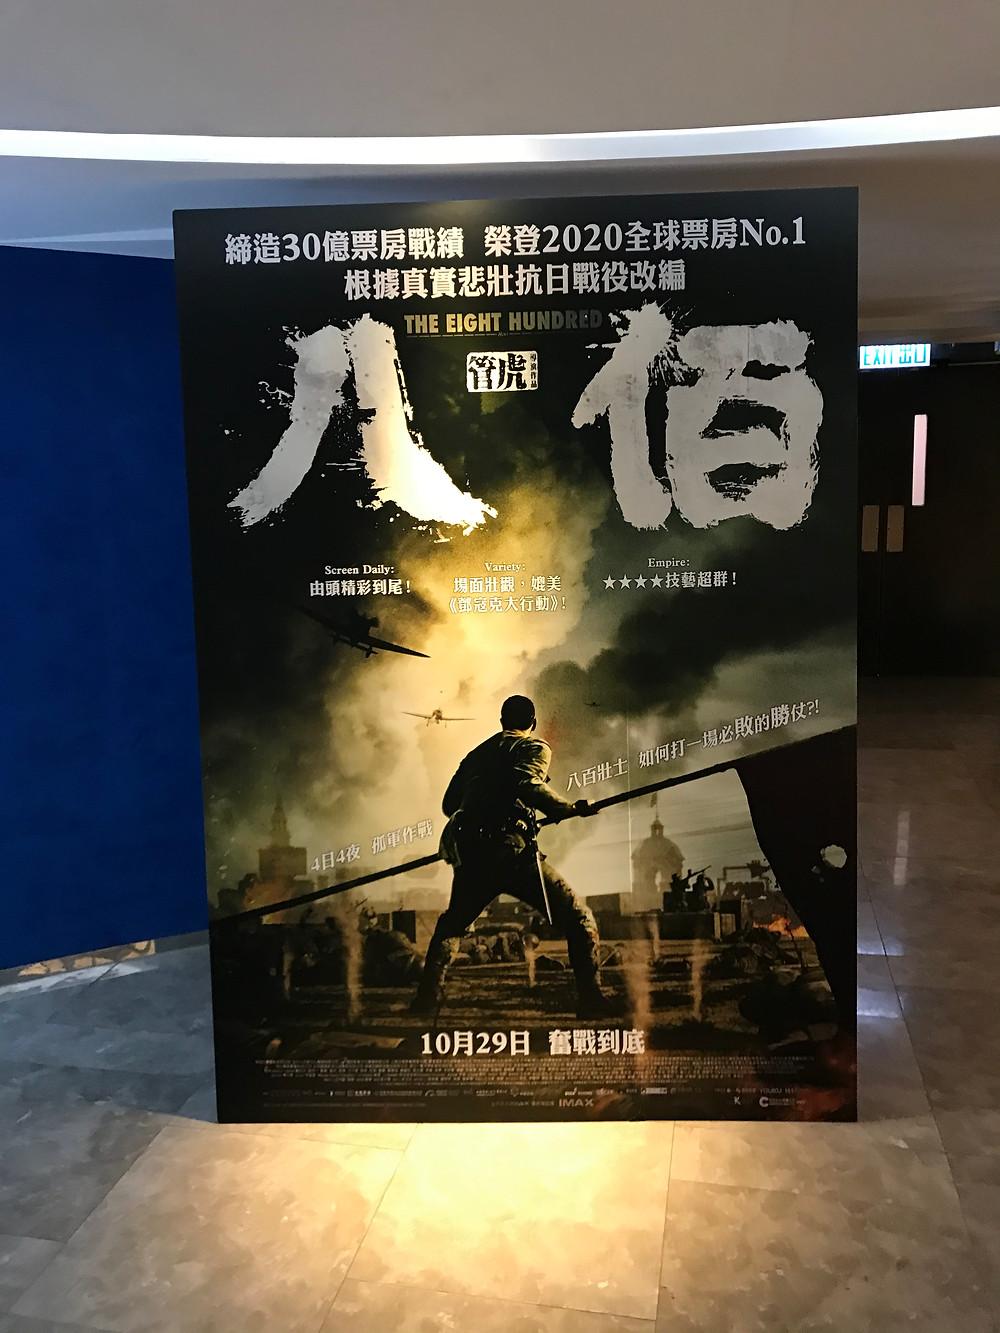 FILE PHOTO: HK IMAX Screening of The Eight Hundred (2020) ©Ryota Nakanishi